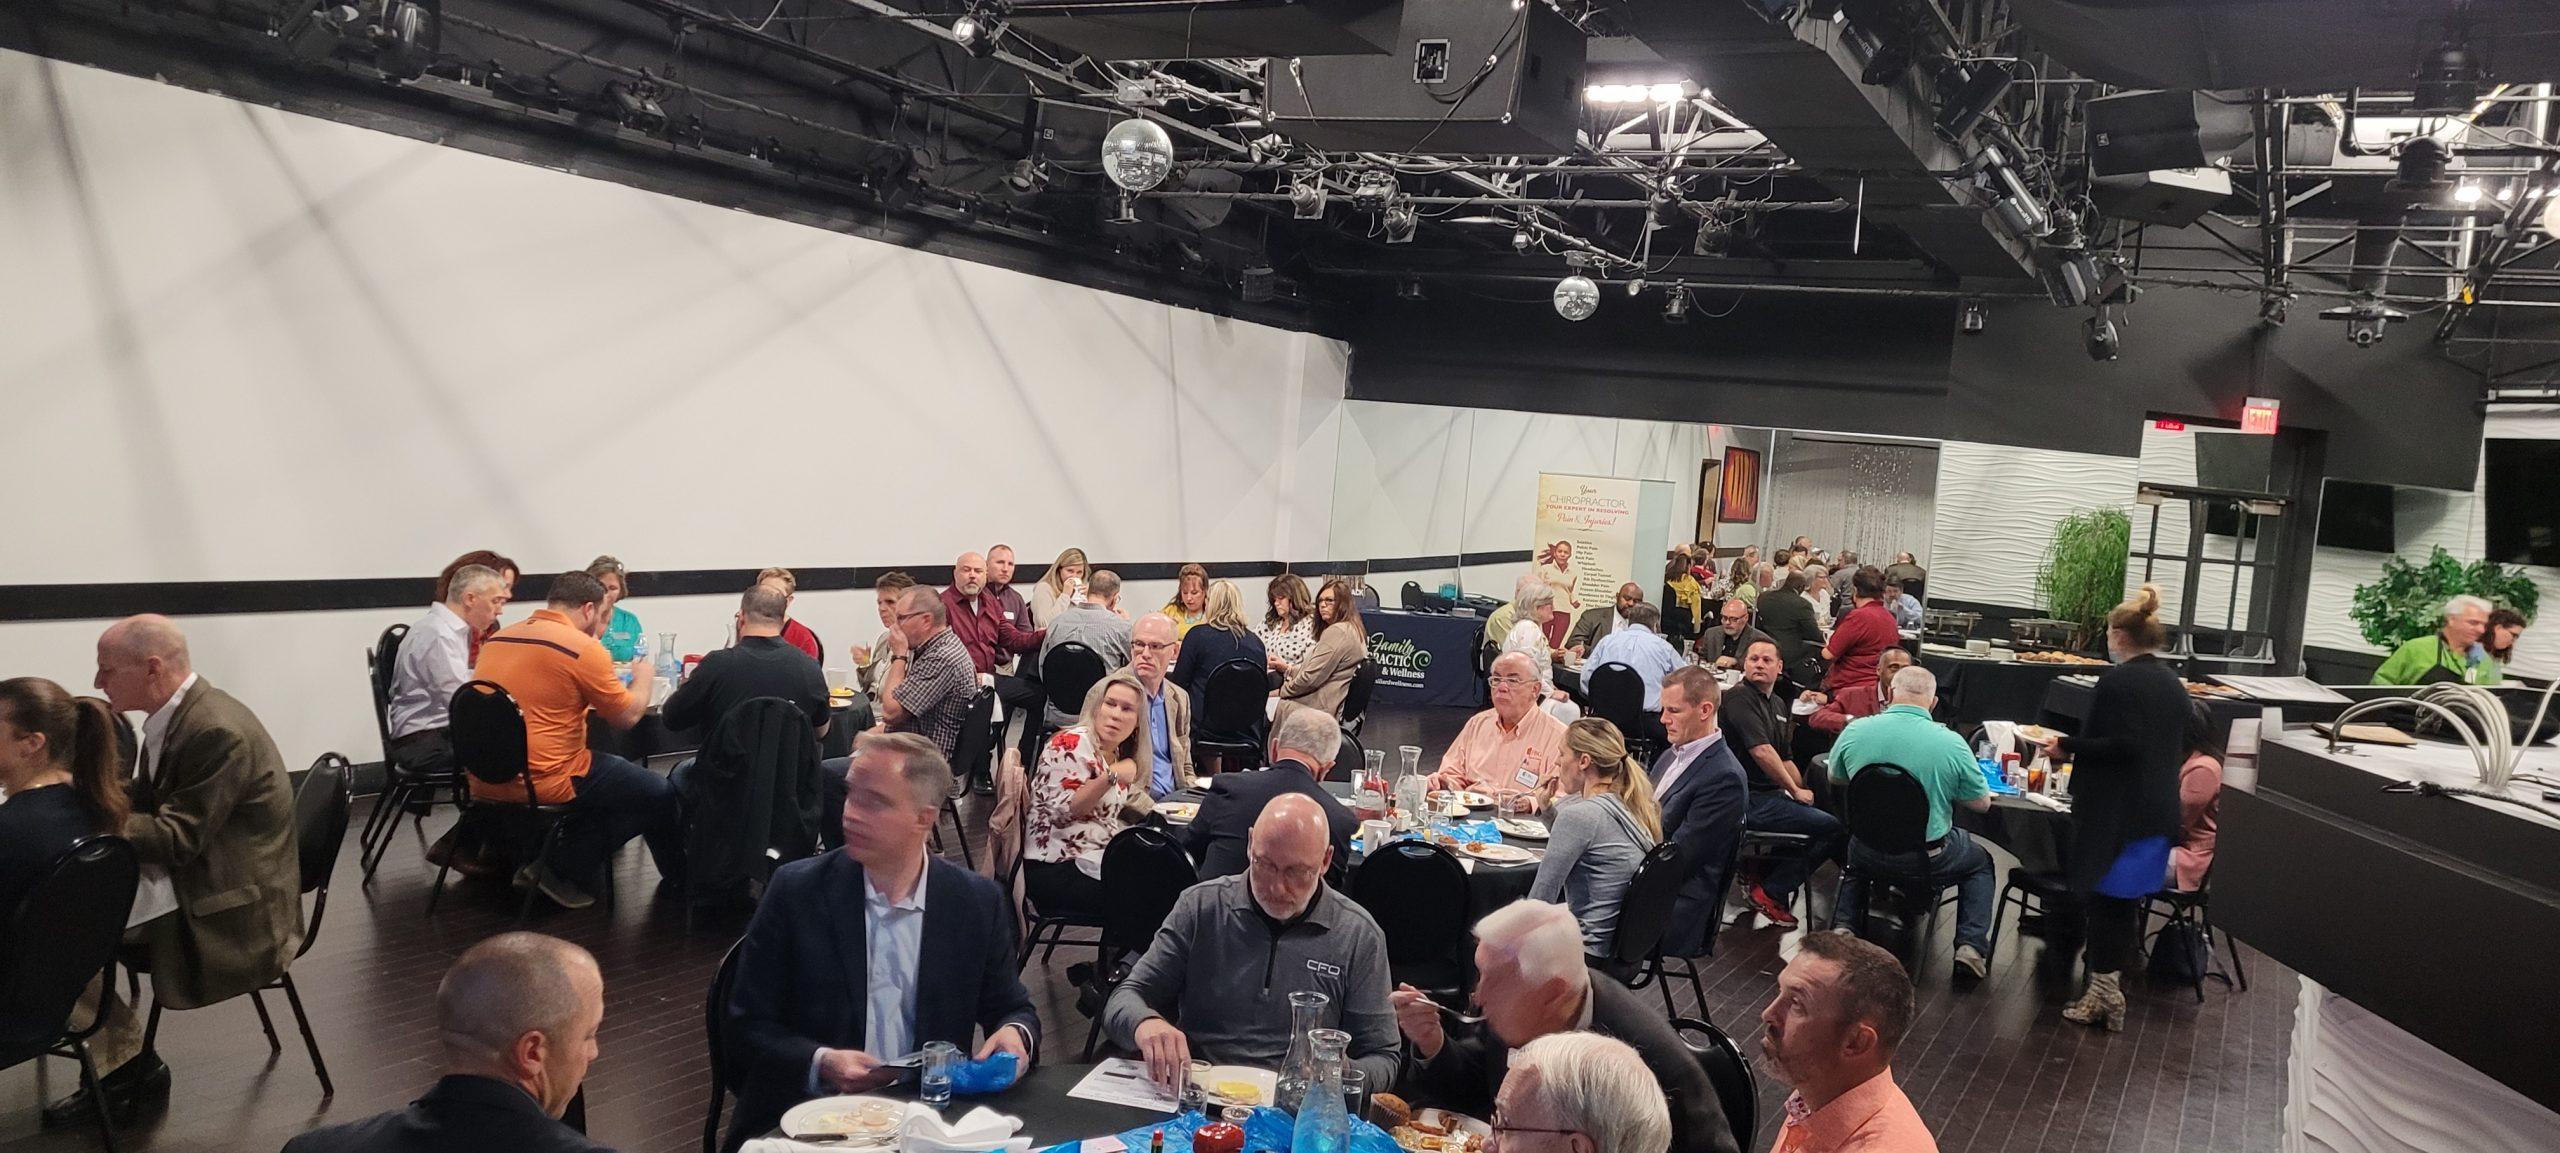 Business networking breakfast | Omaha Empowerment Breakfast.